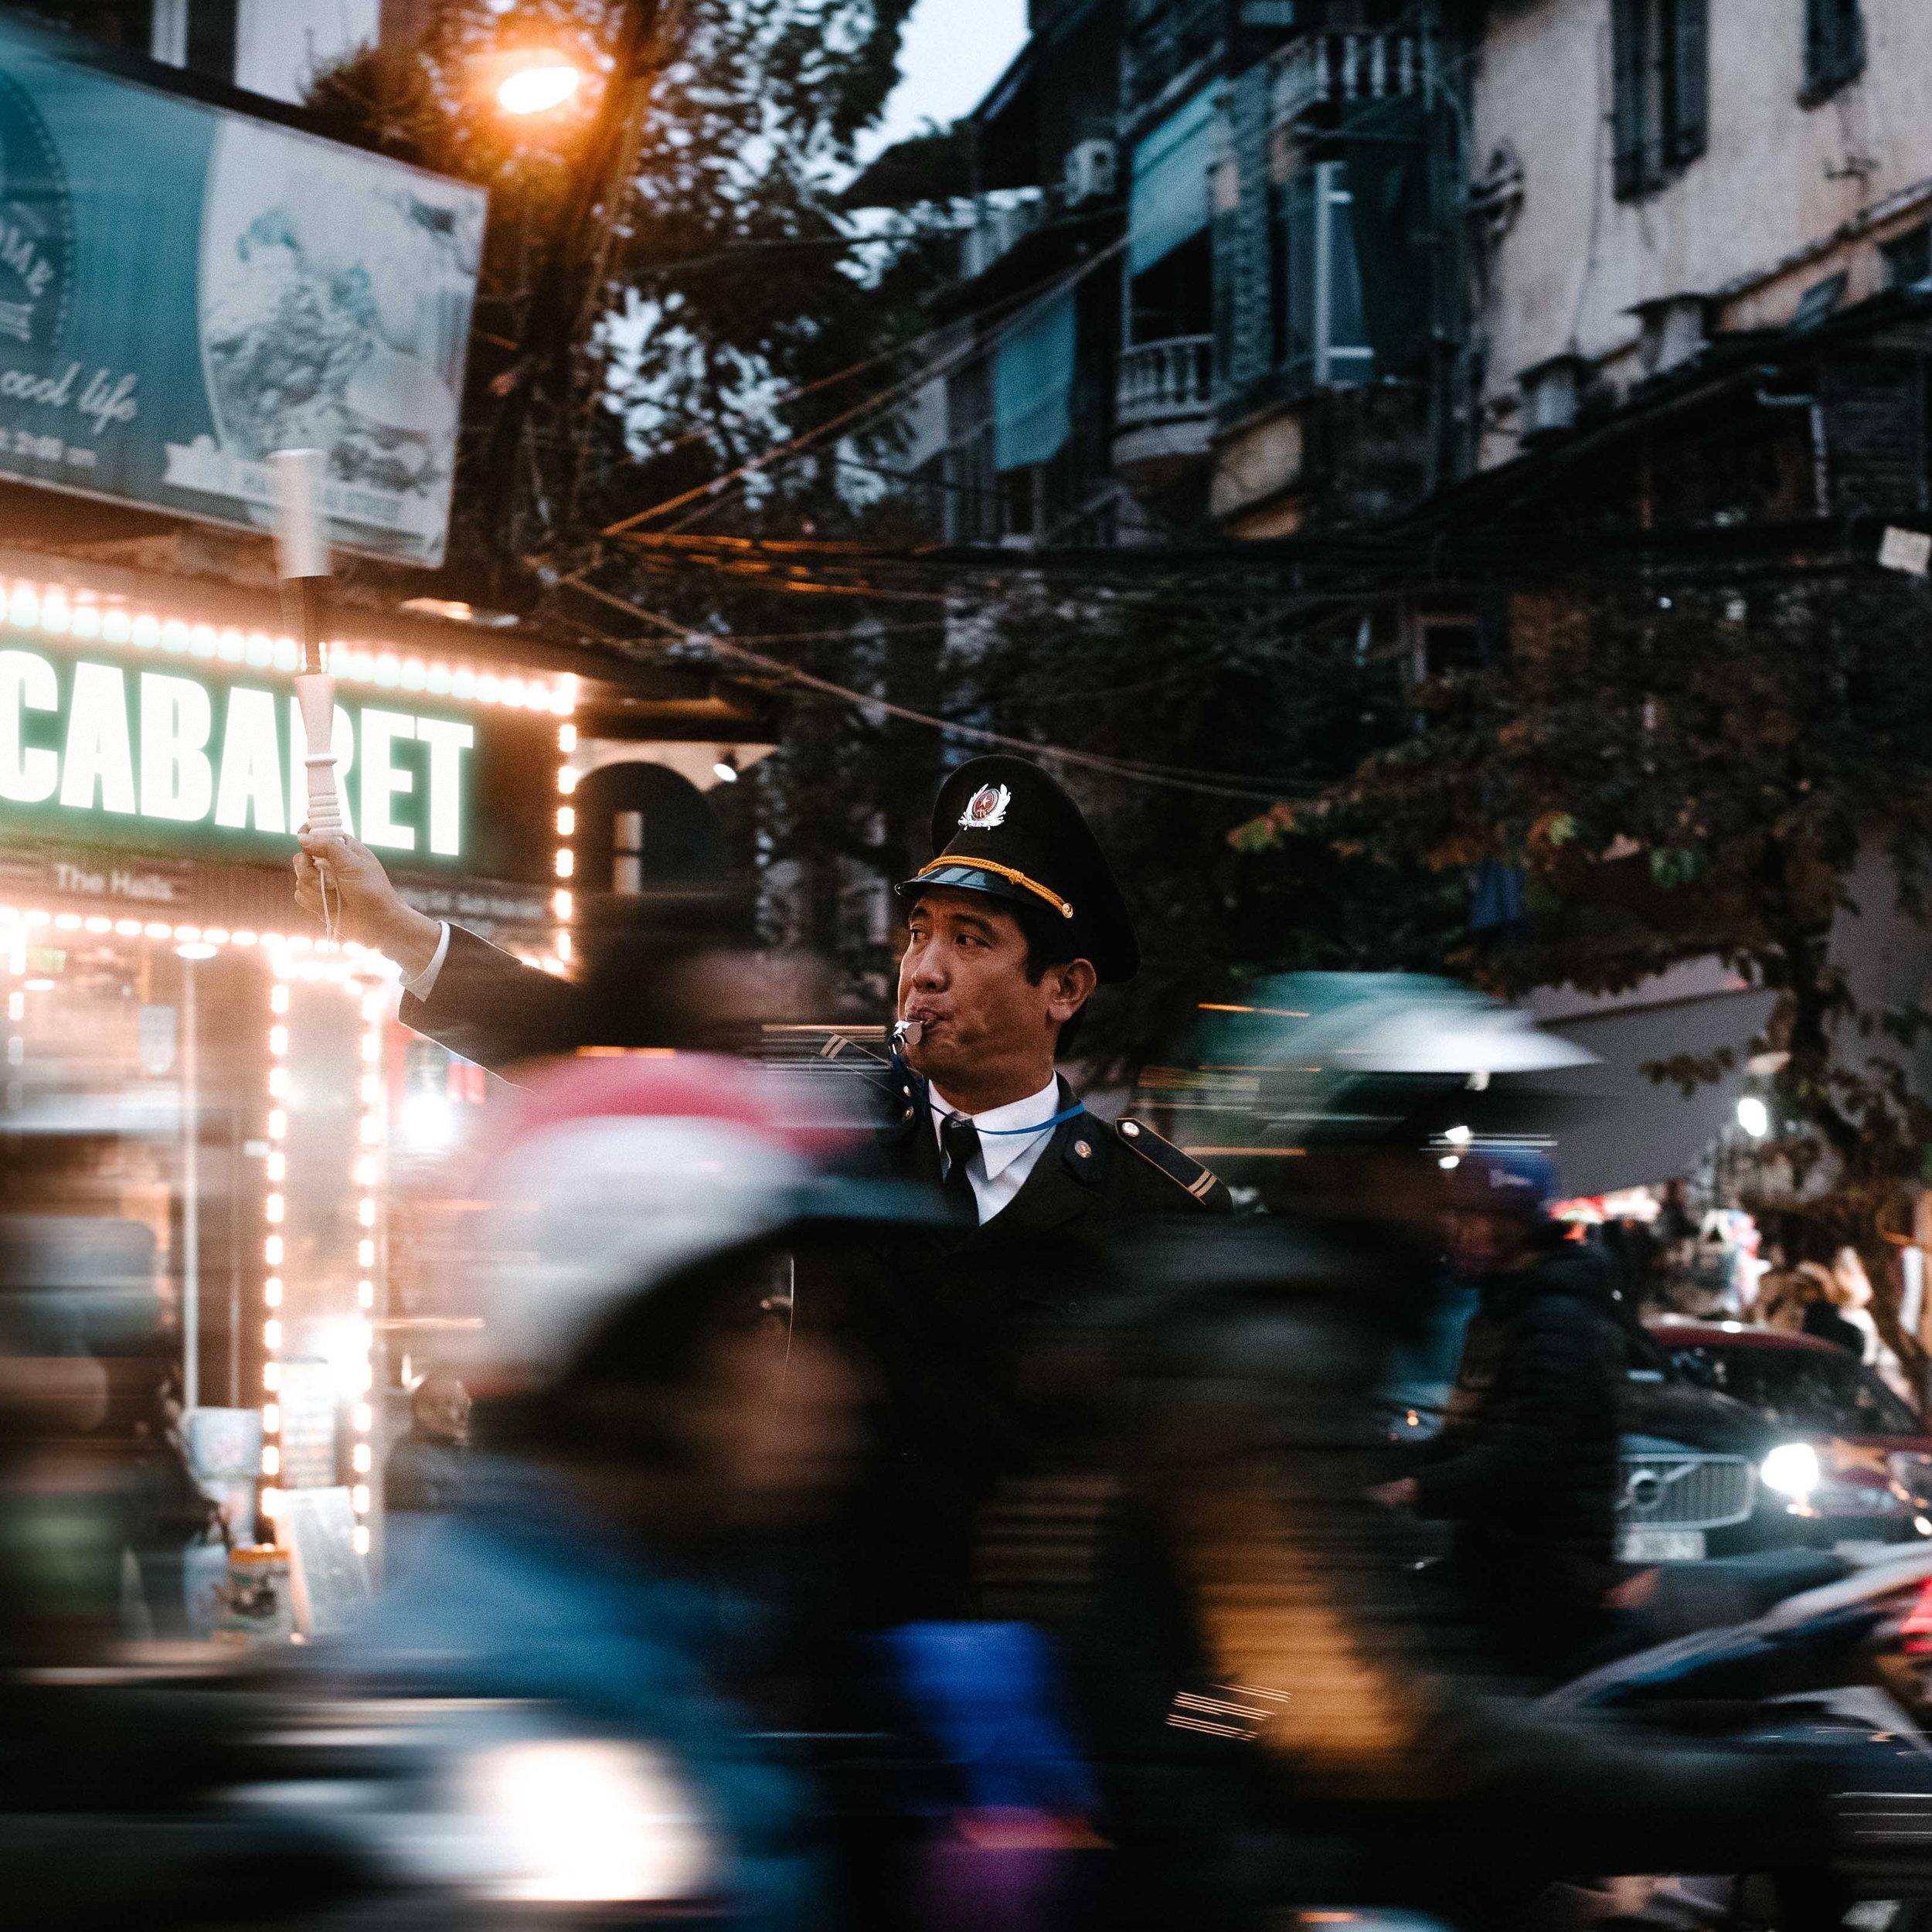 Cabaret - Single (2019) - 1. Cabaret